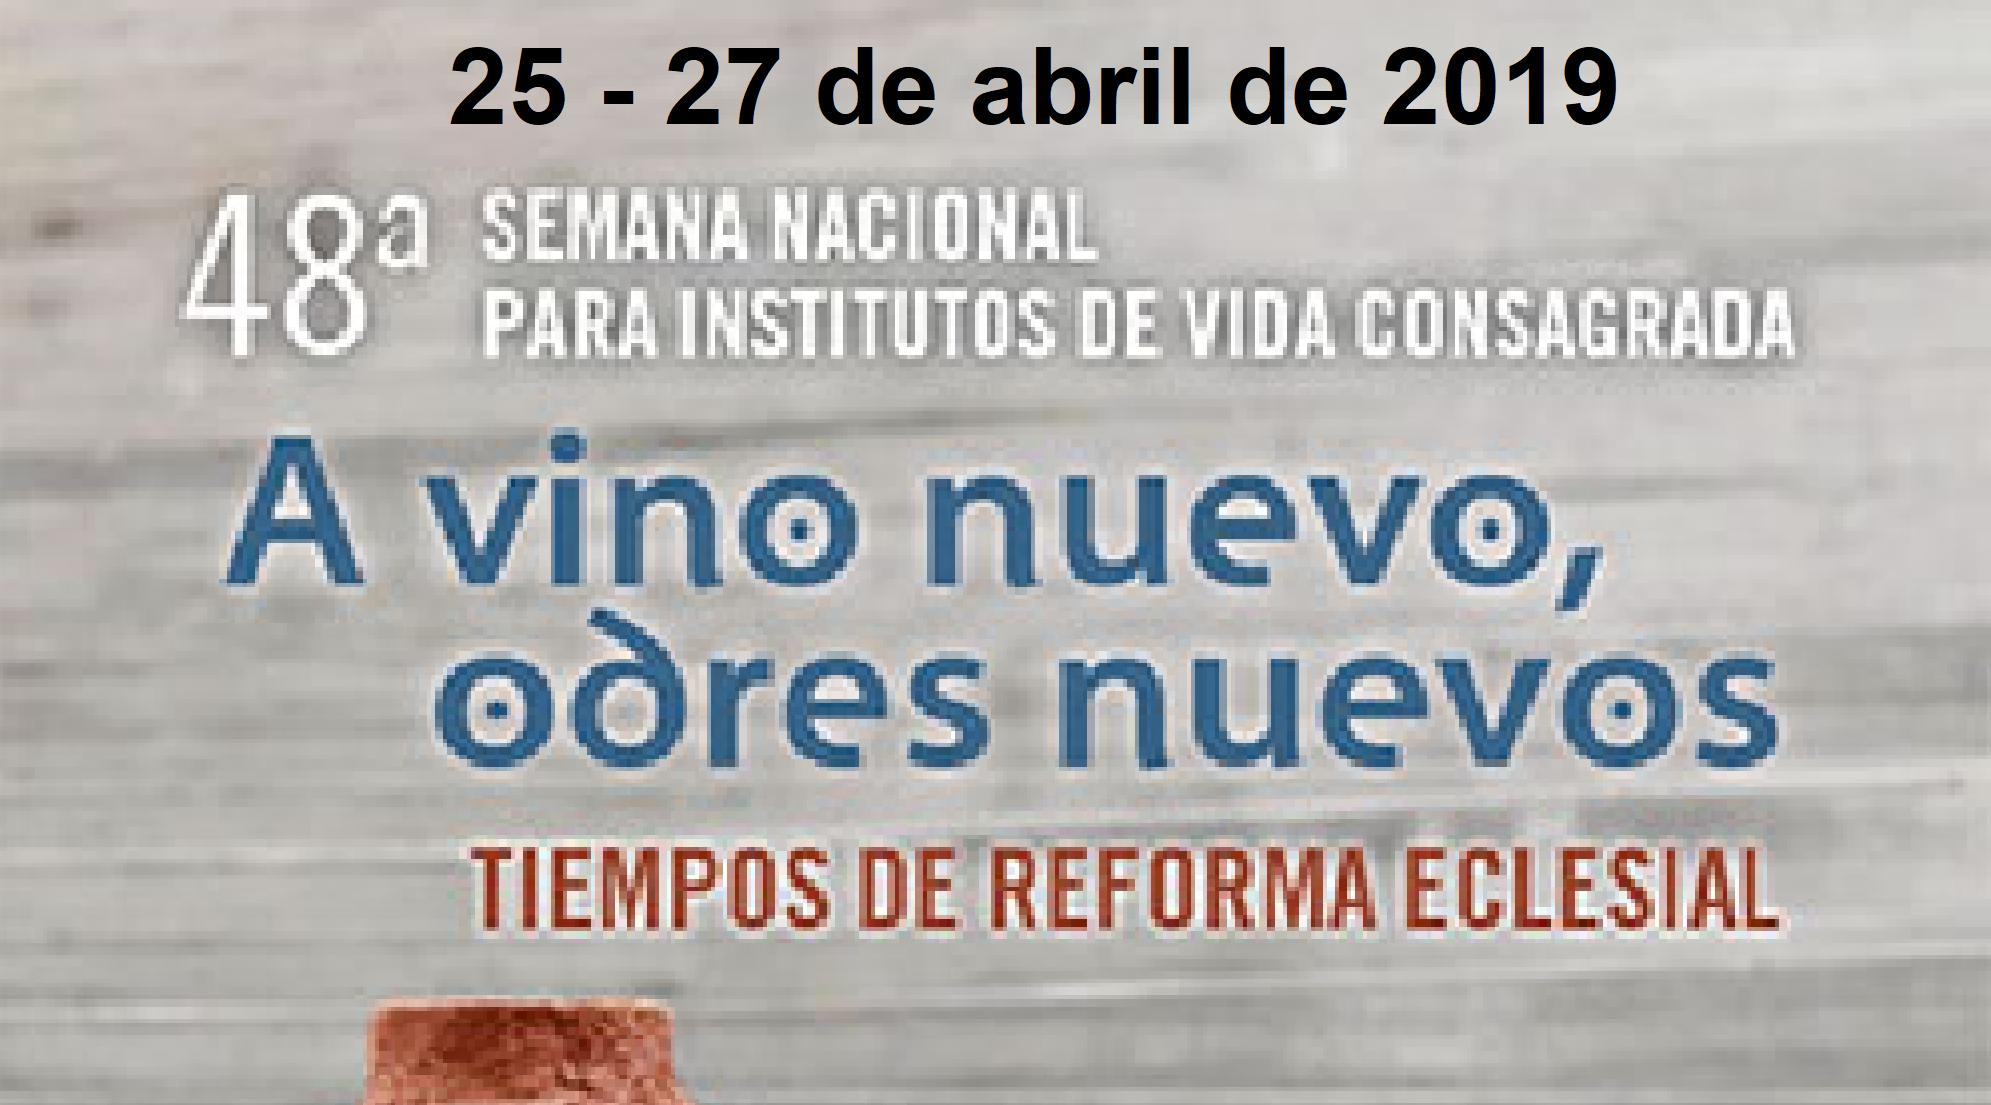 Información 48º Semana Nacional para Institutos de Vida Consagrada